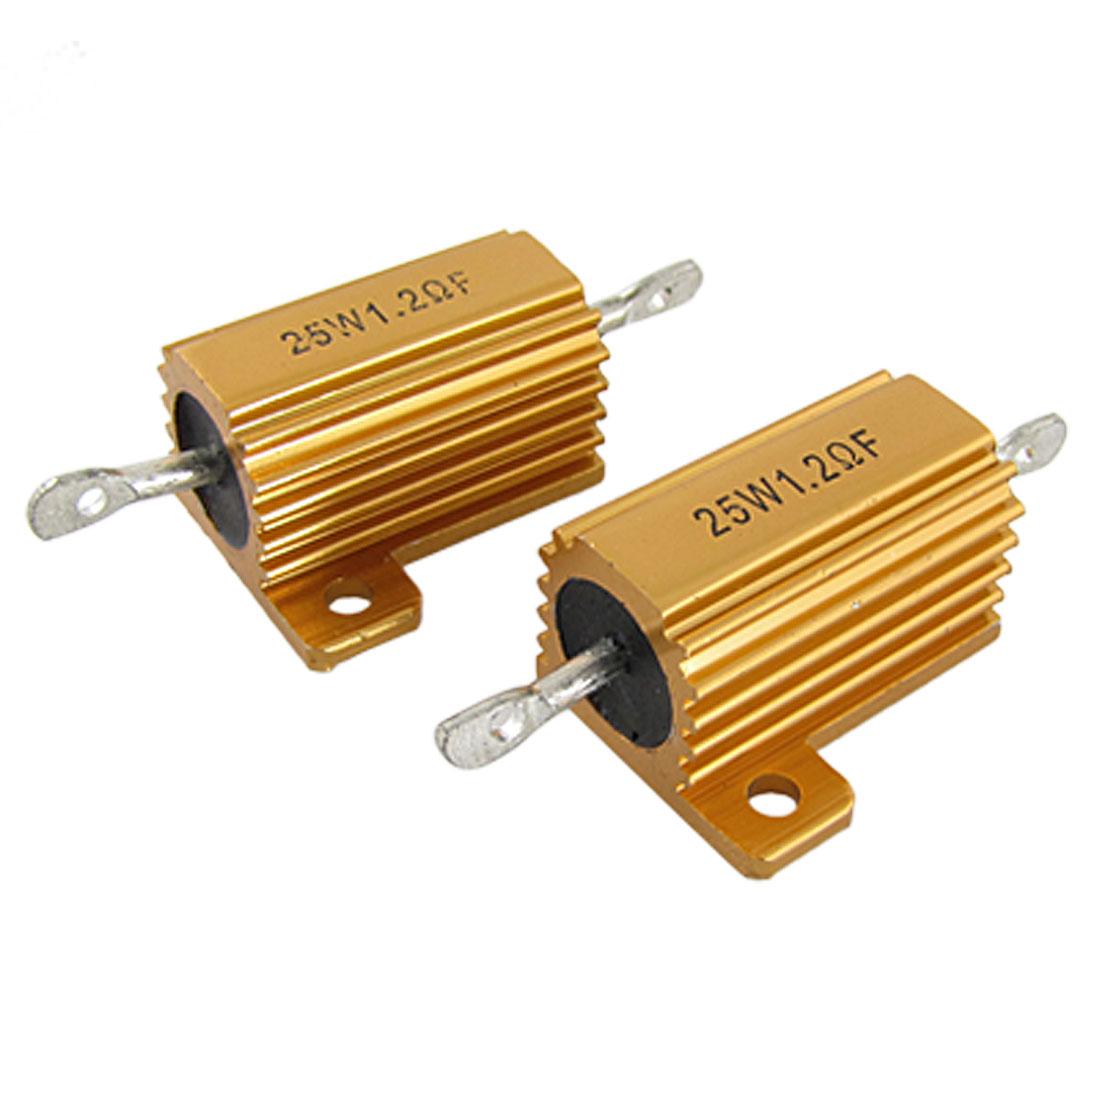 2 Pcs Gold Tone 25W 1.2 Ohm 1% Aluminum Case Wirewound Resistors